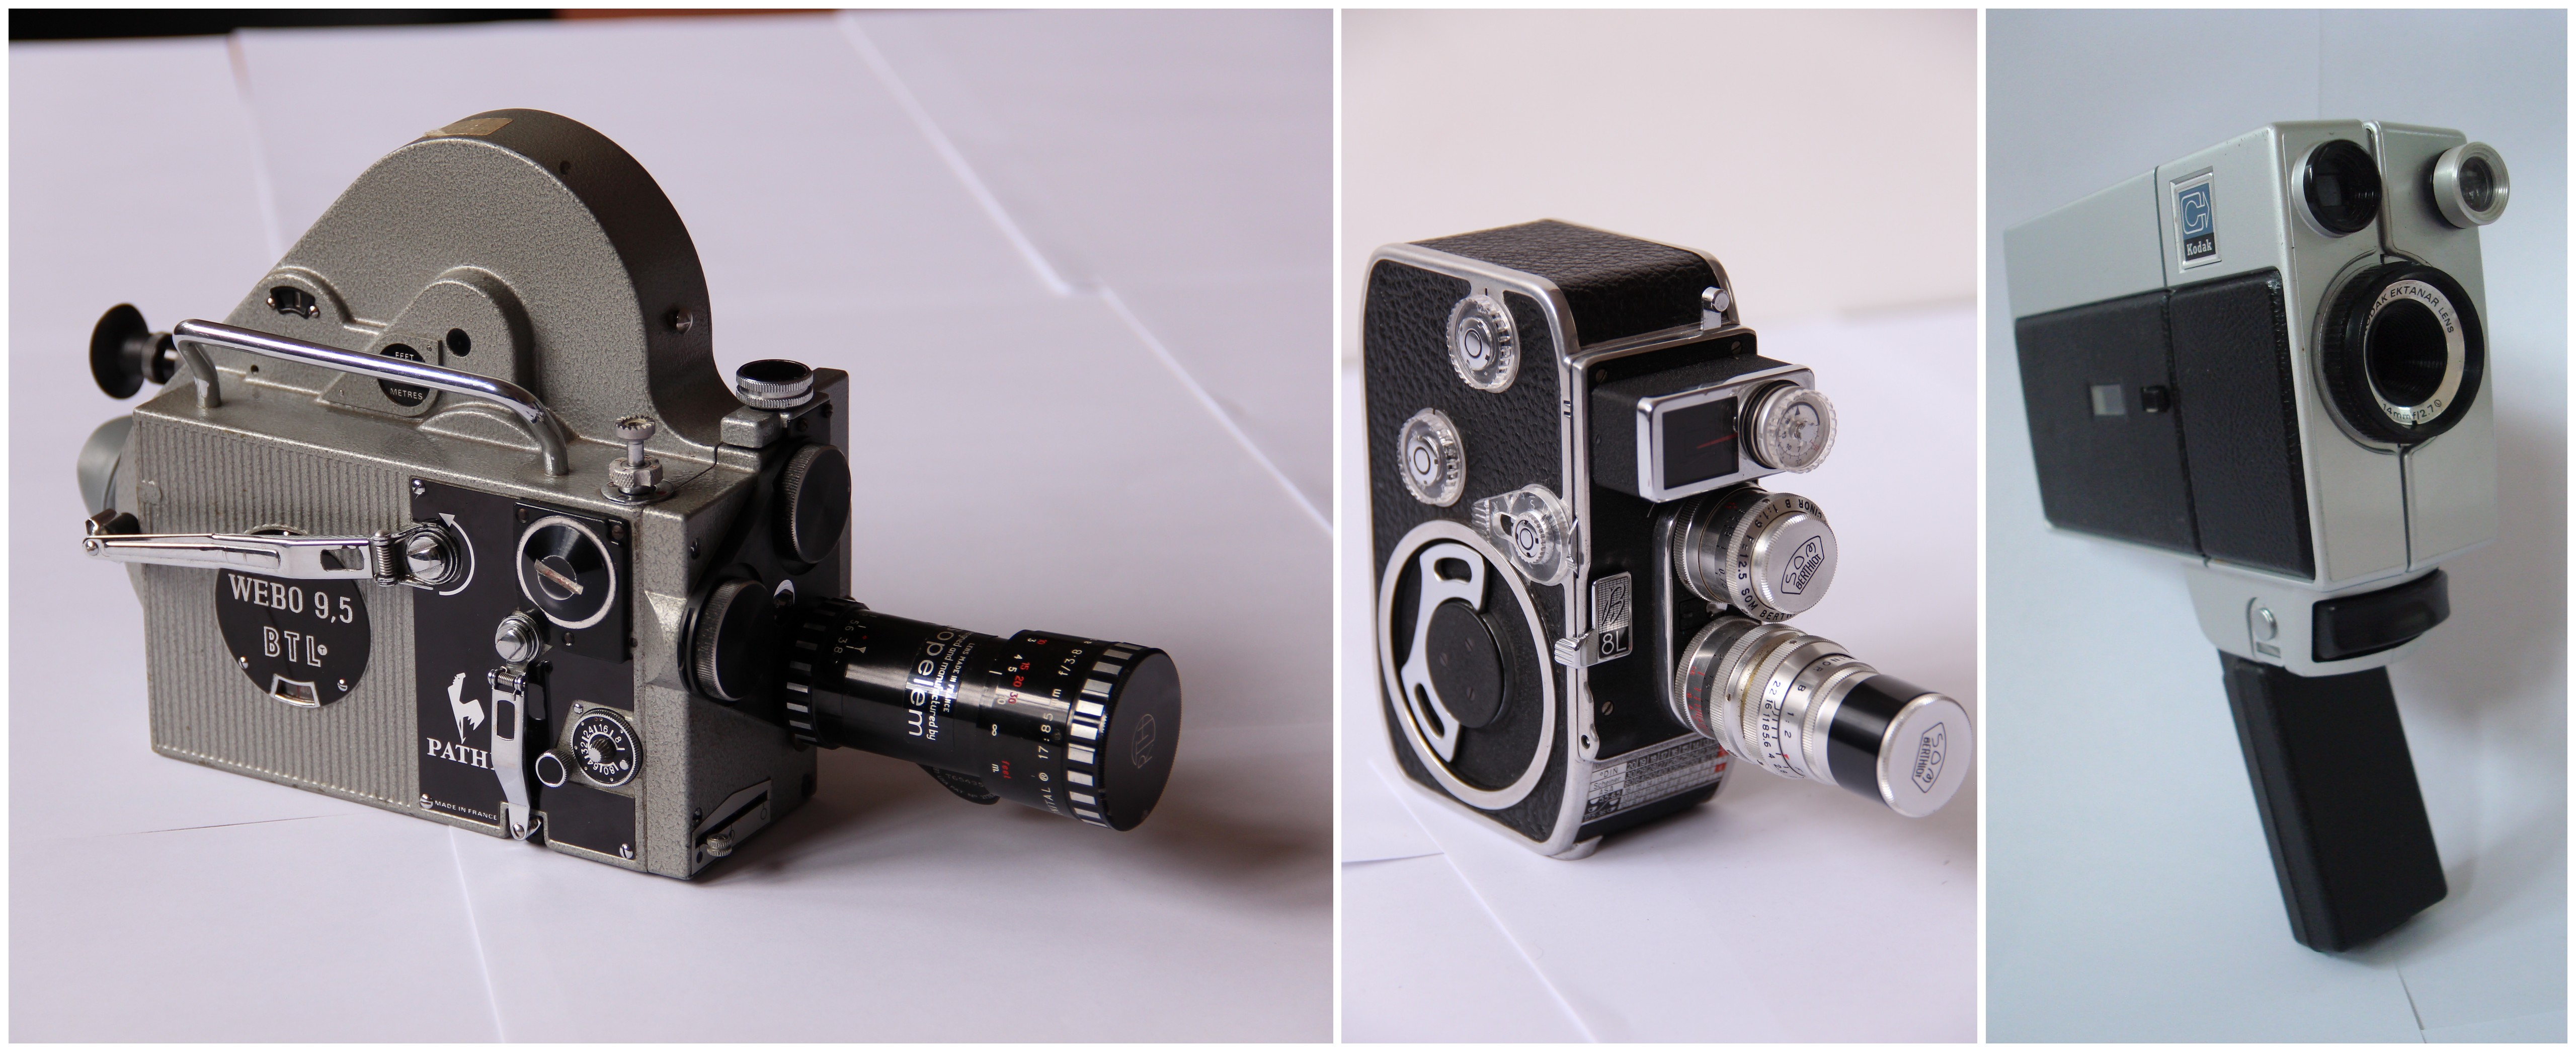 Caméras 9,5 mm Pathé Wébo, 8 mm Paillard Bolex B8 et Super 8 Kodak © Ciclic Mémoire